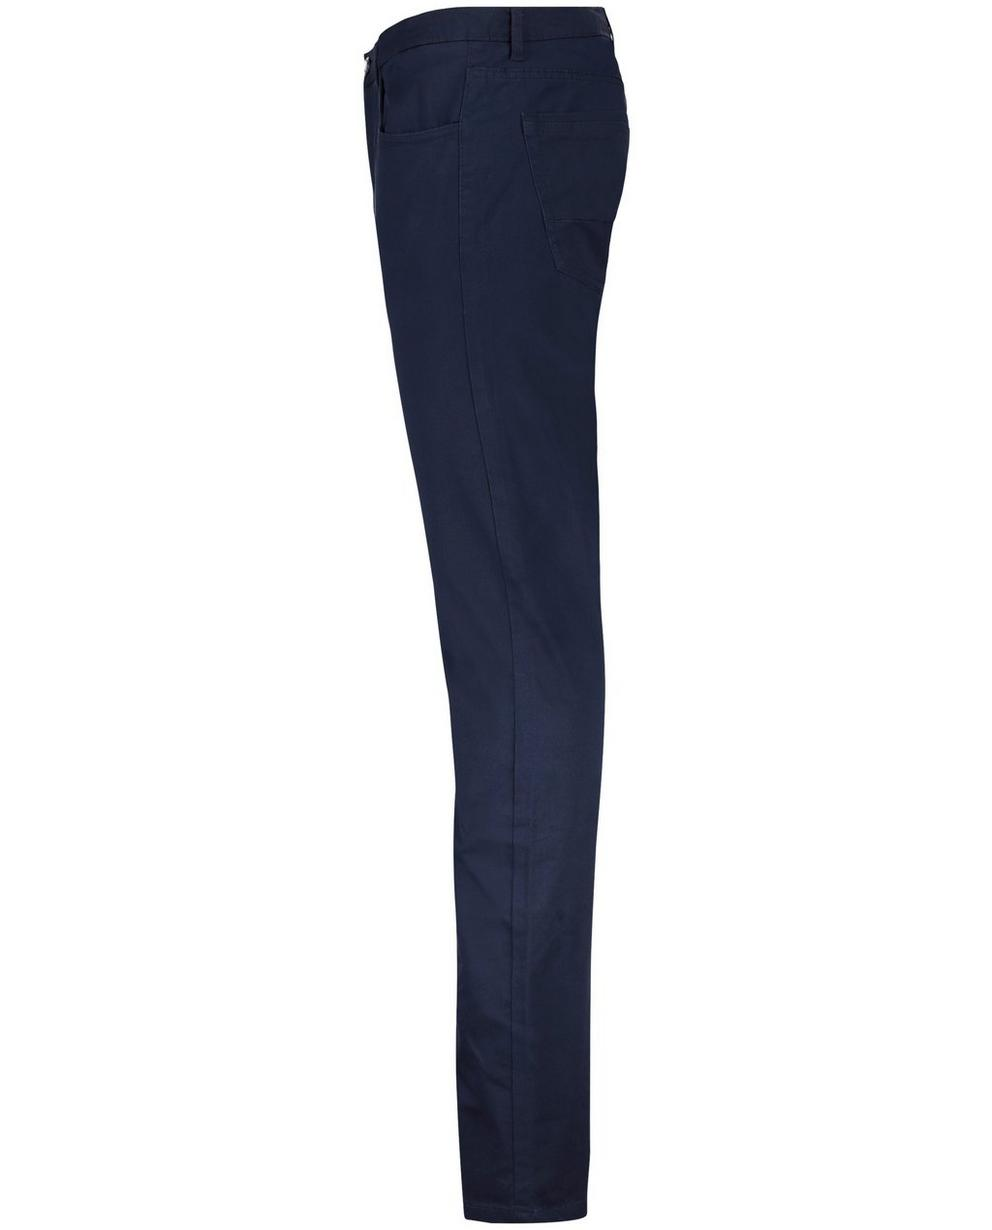 Pantalons - navy - Pantalon slim fit SMITH